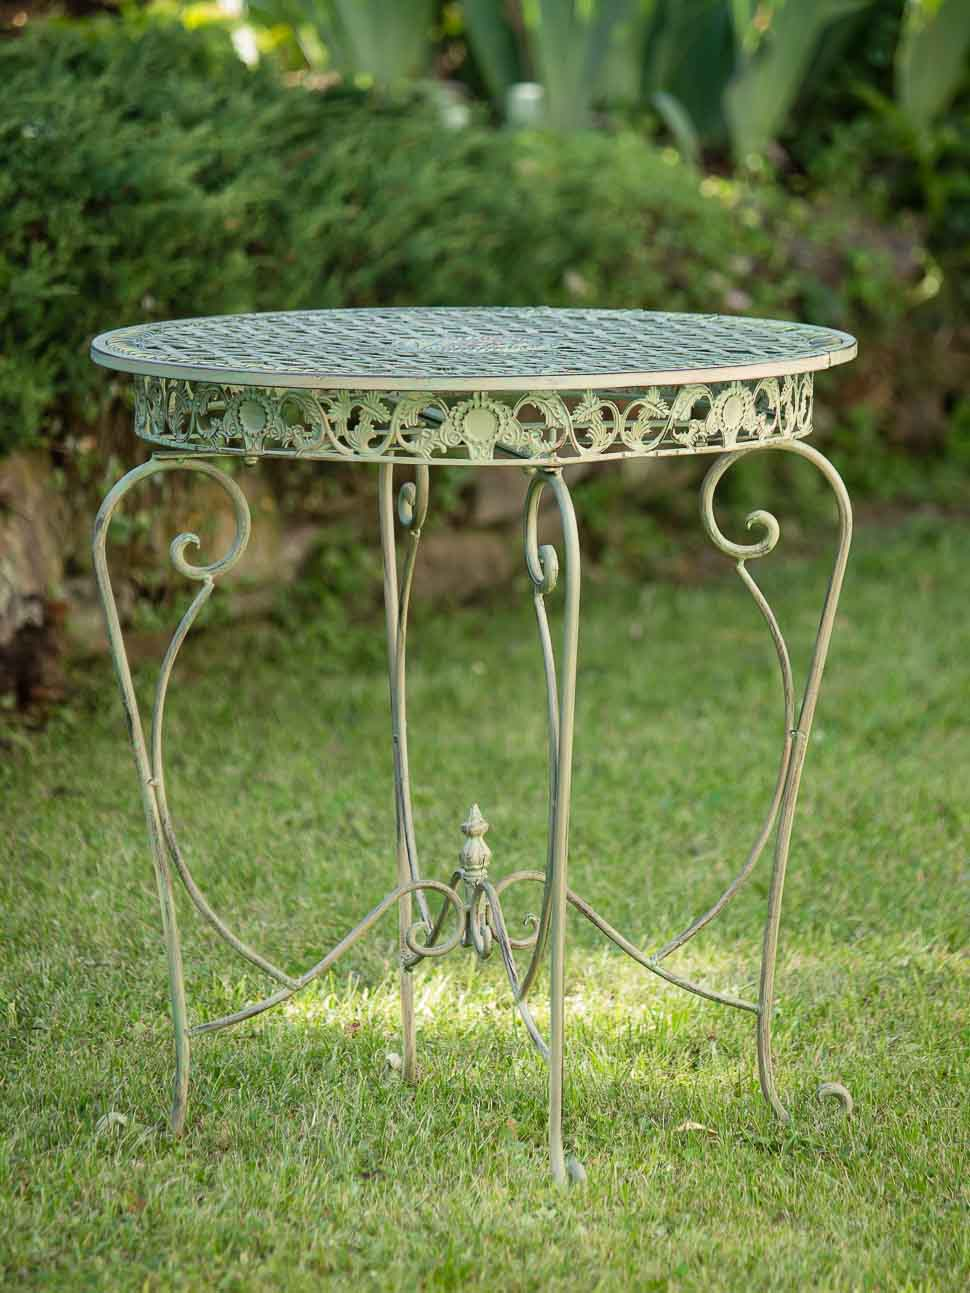 table de jardin dans une cremeuse table verte jardin fer table lumineuse de aubaho